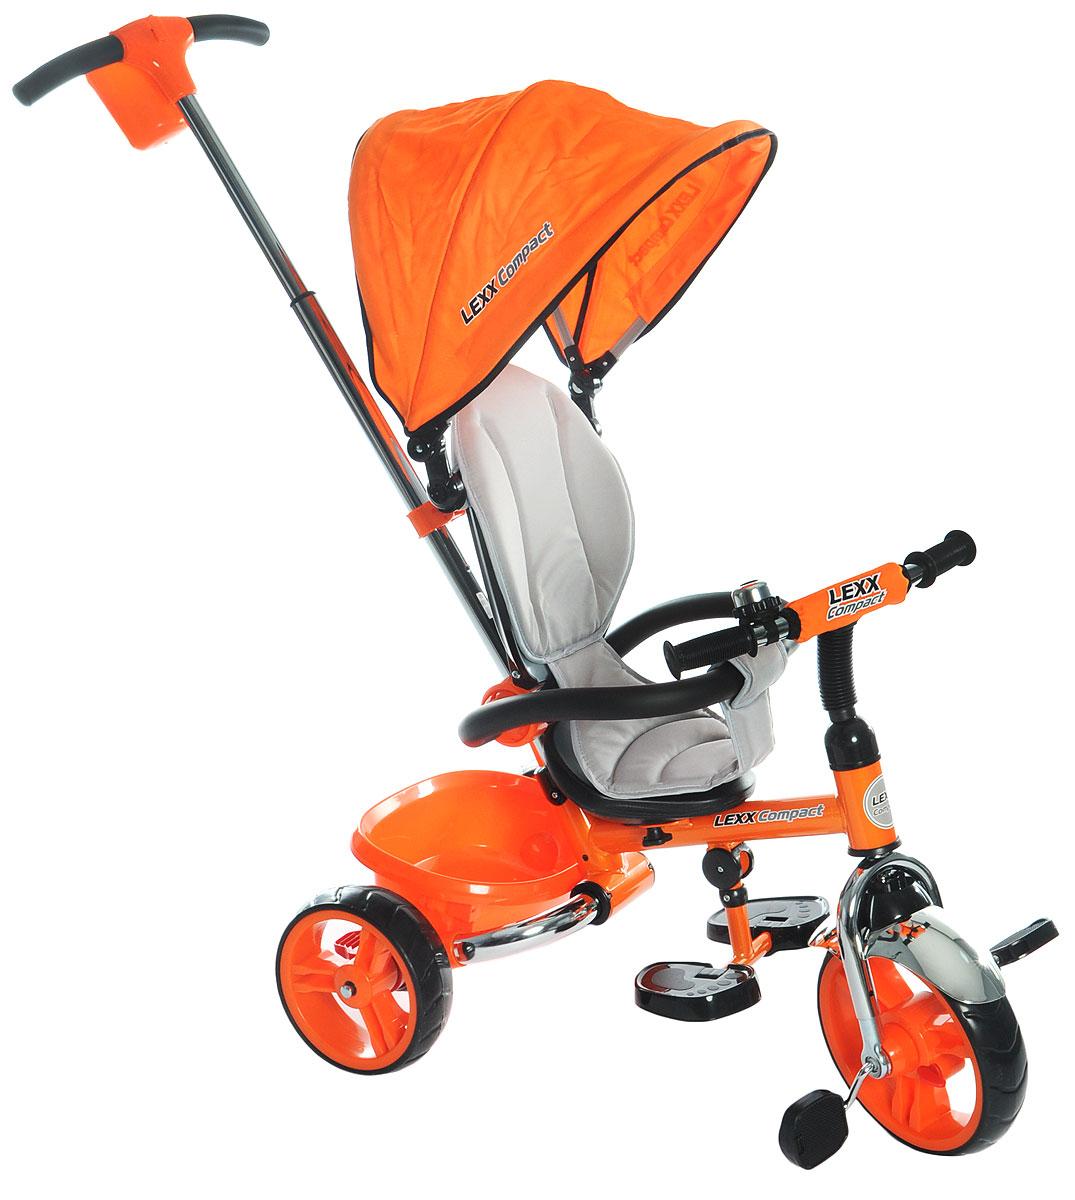 GT Велосипед-каталка GT8763 Lexx Compact цвет оранжевый